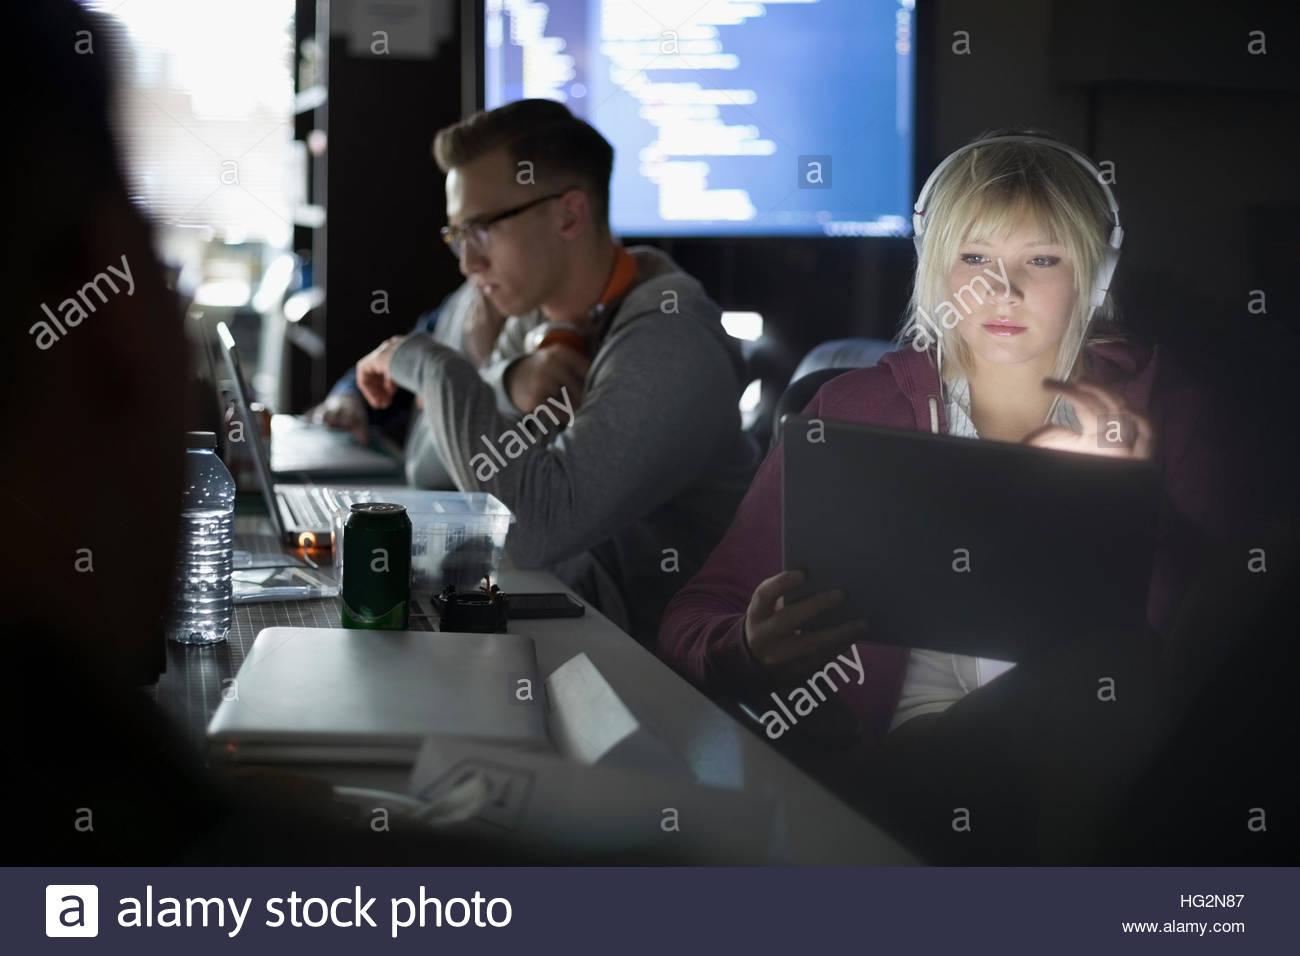 Focused female hacker working hackathon with laptop and headphones - Stock Image